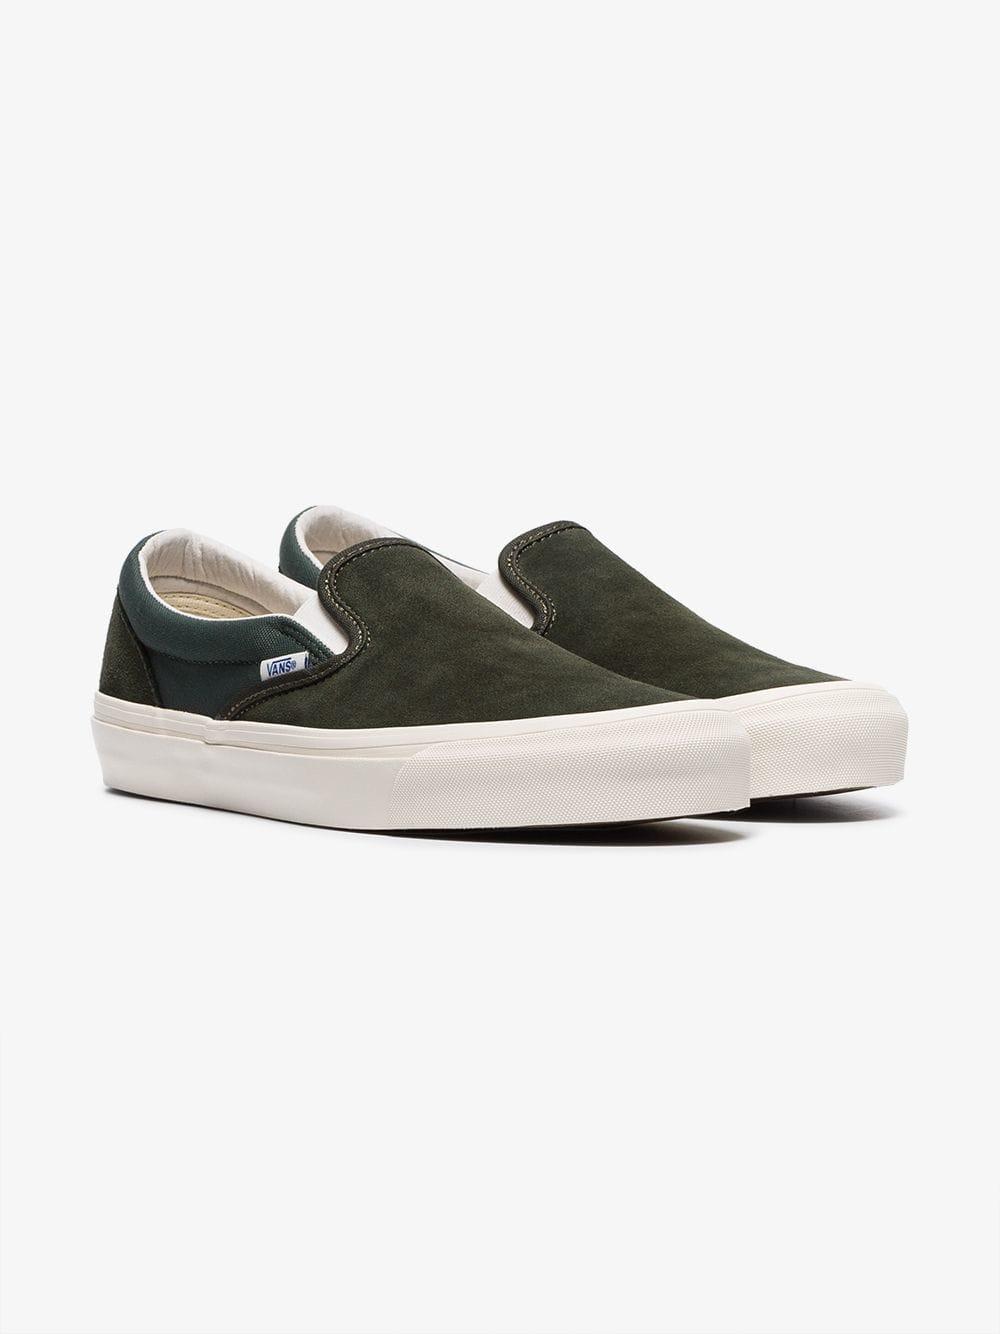 9dc63643bd Vans - Green Vault Og Slip On Suede Sneakers for Men - Lyst. View fullscreen